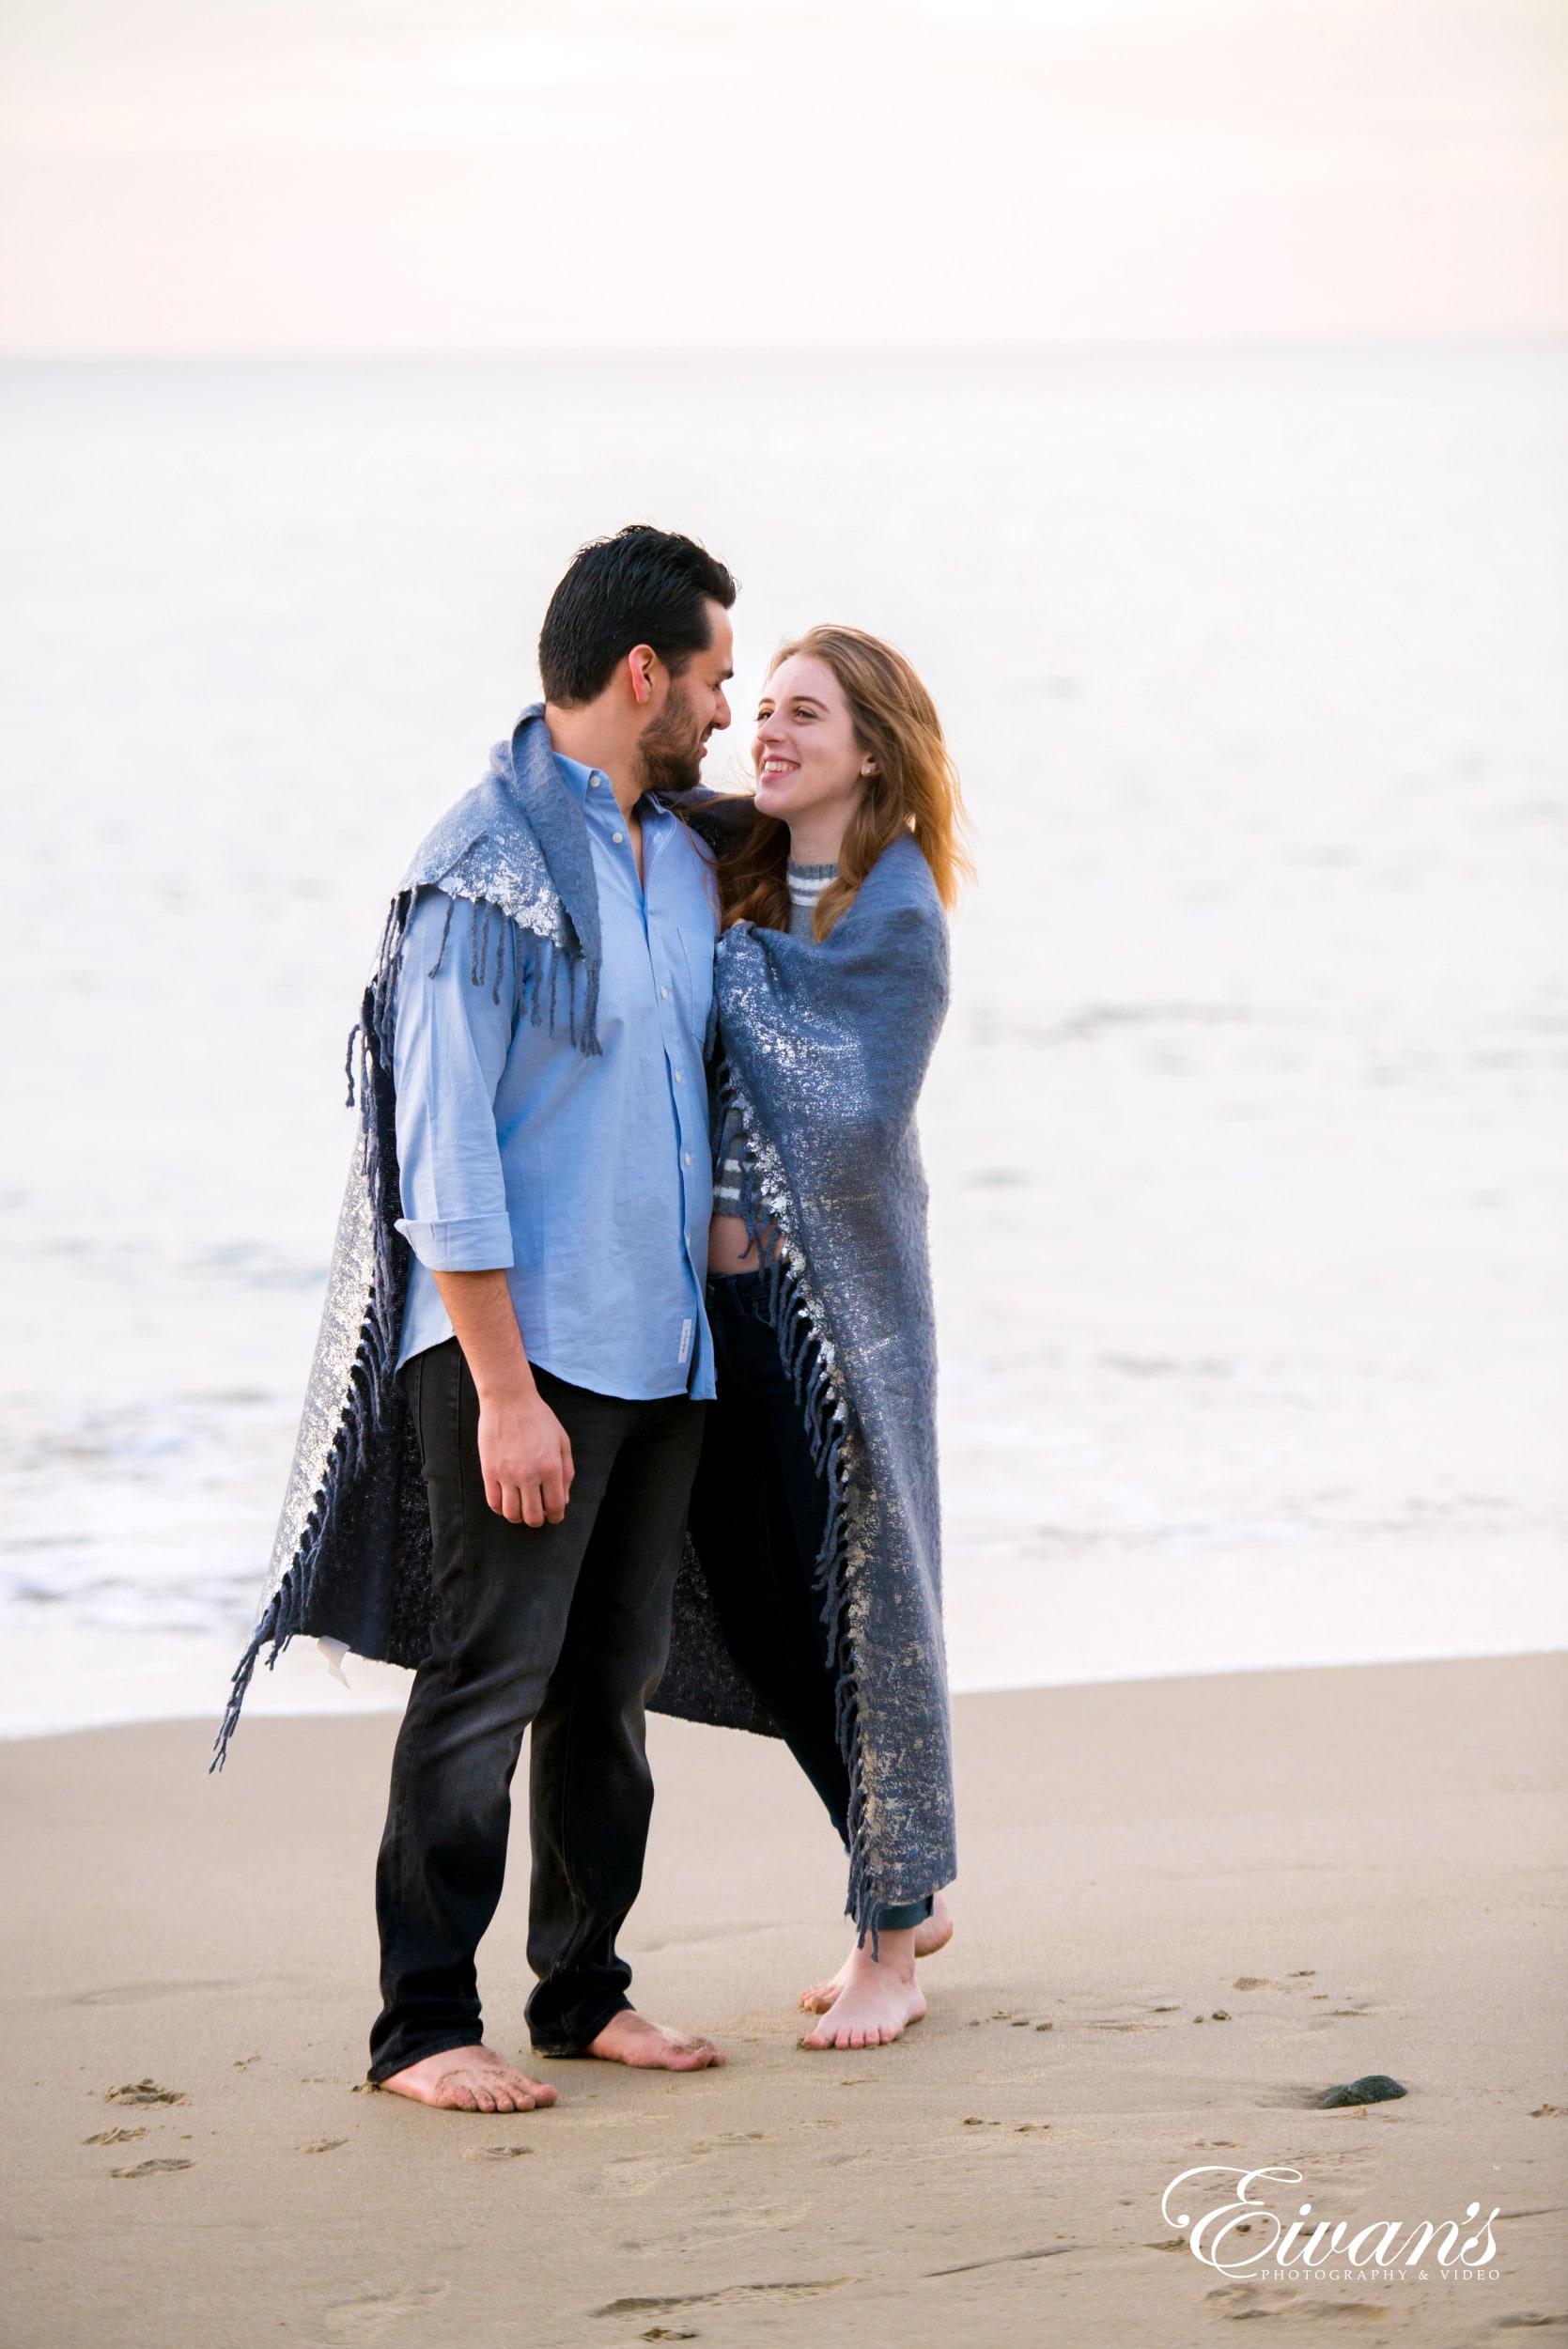 man in blue denim jacket hugging woman in black pants on beach during daytime